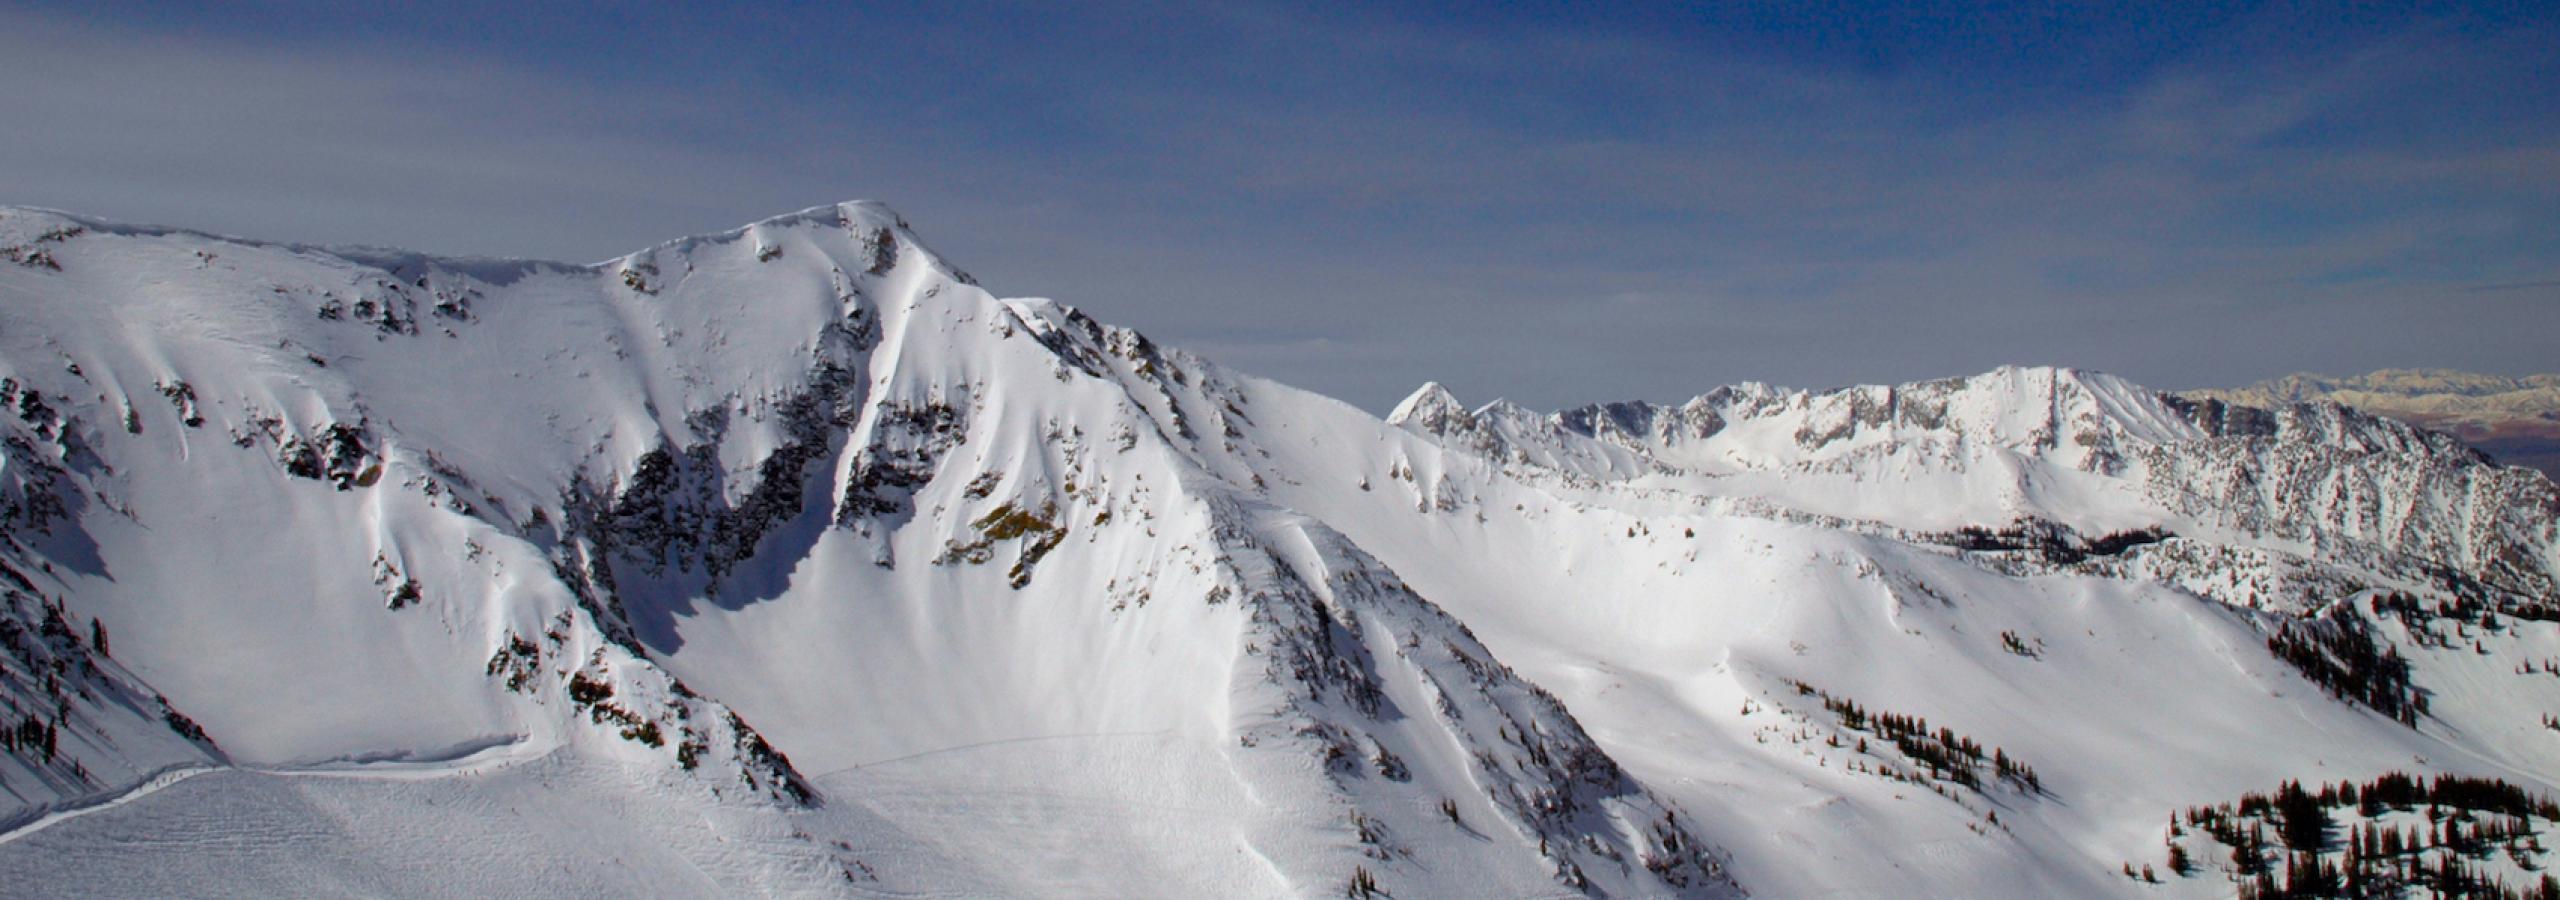 Картинки по запросу Great Scott ski run